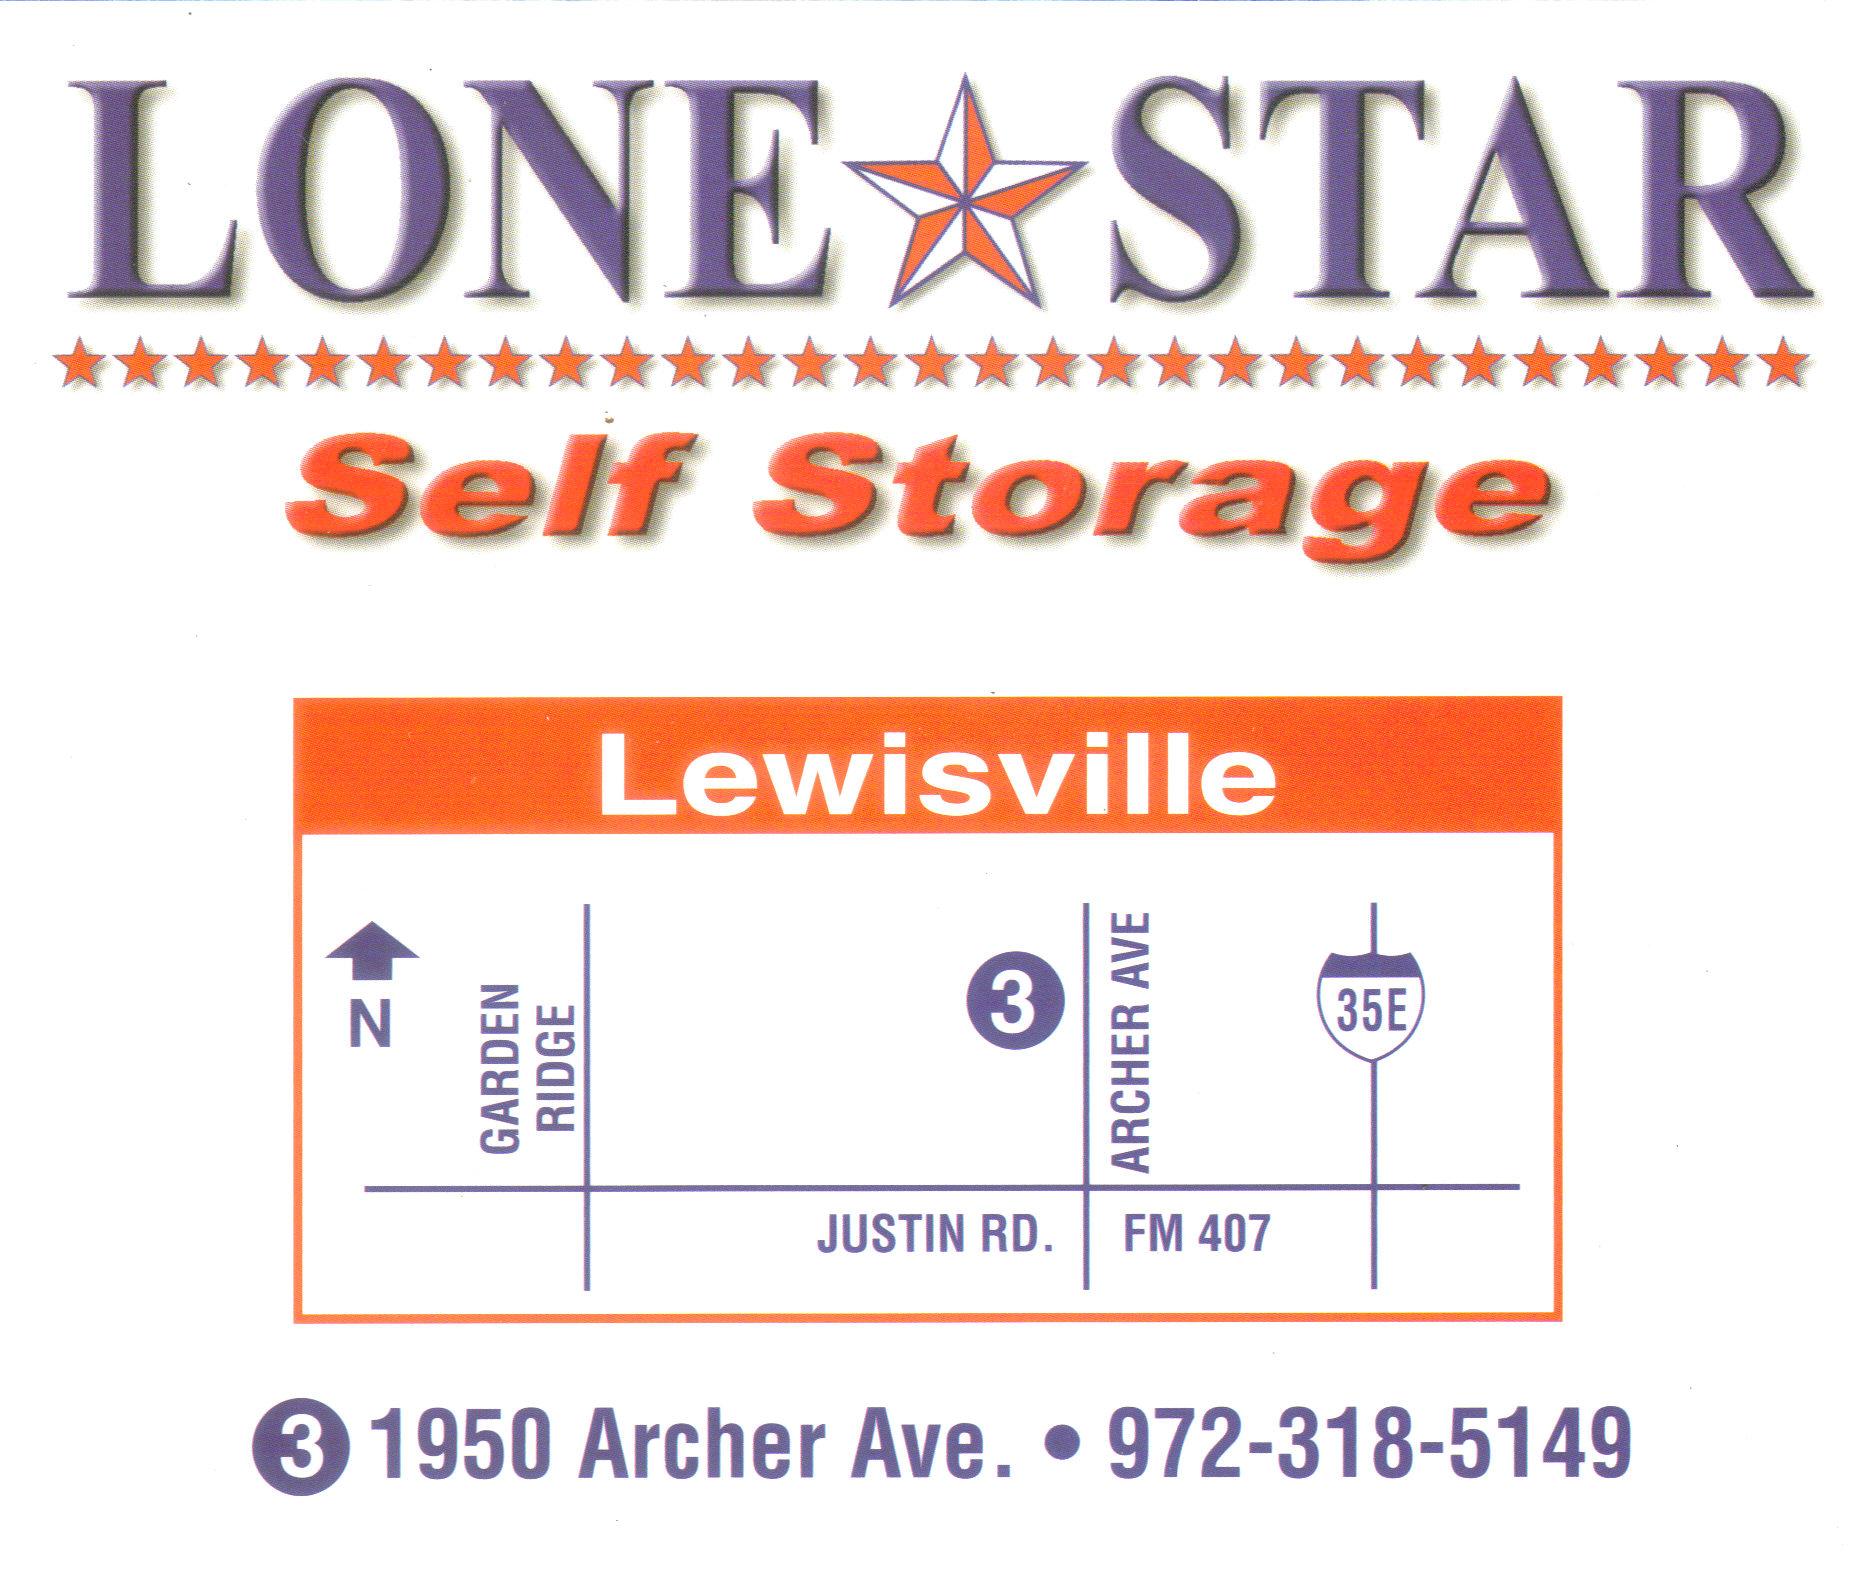 Lonestar Self Storage